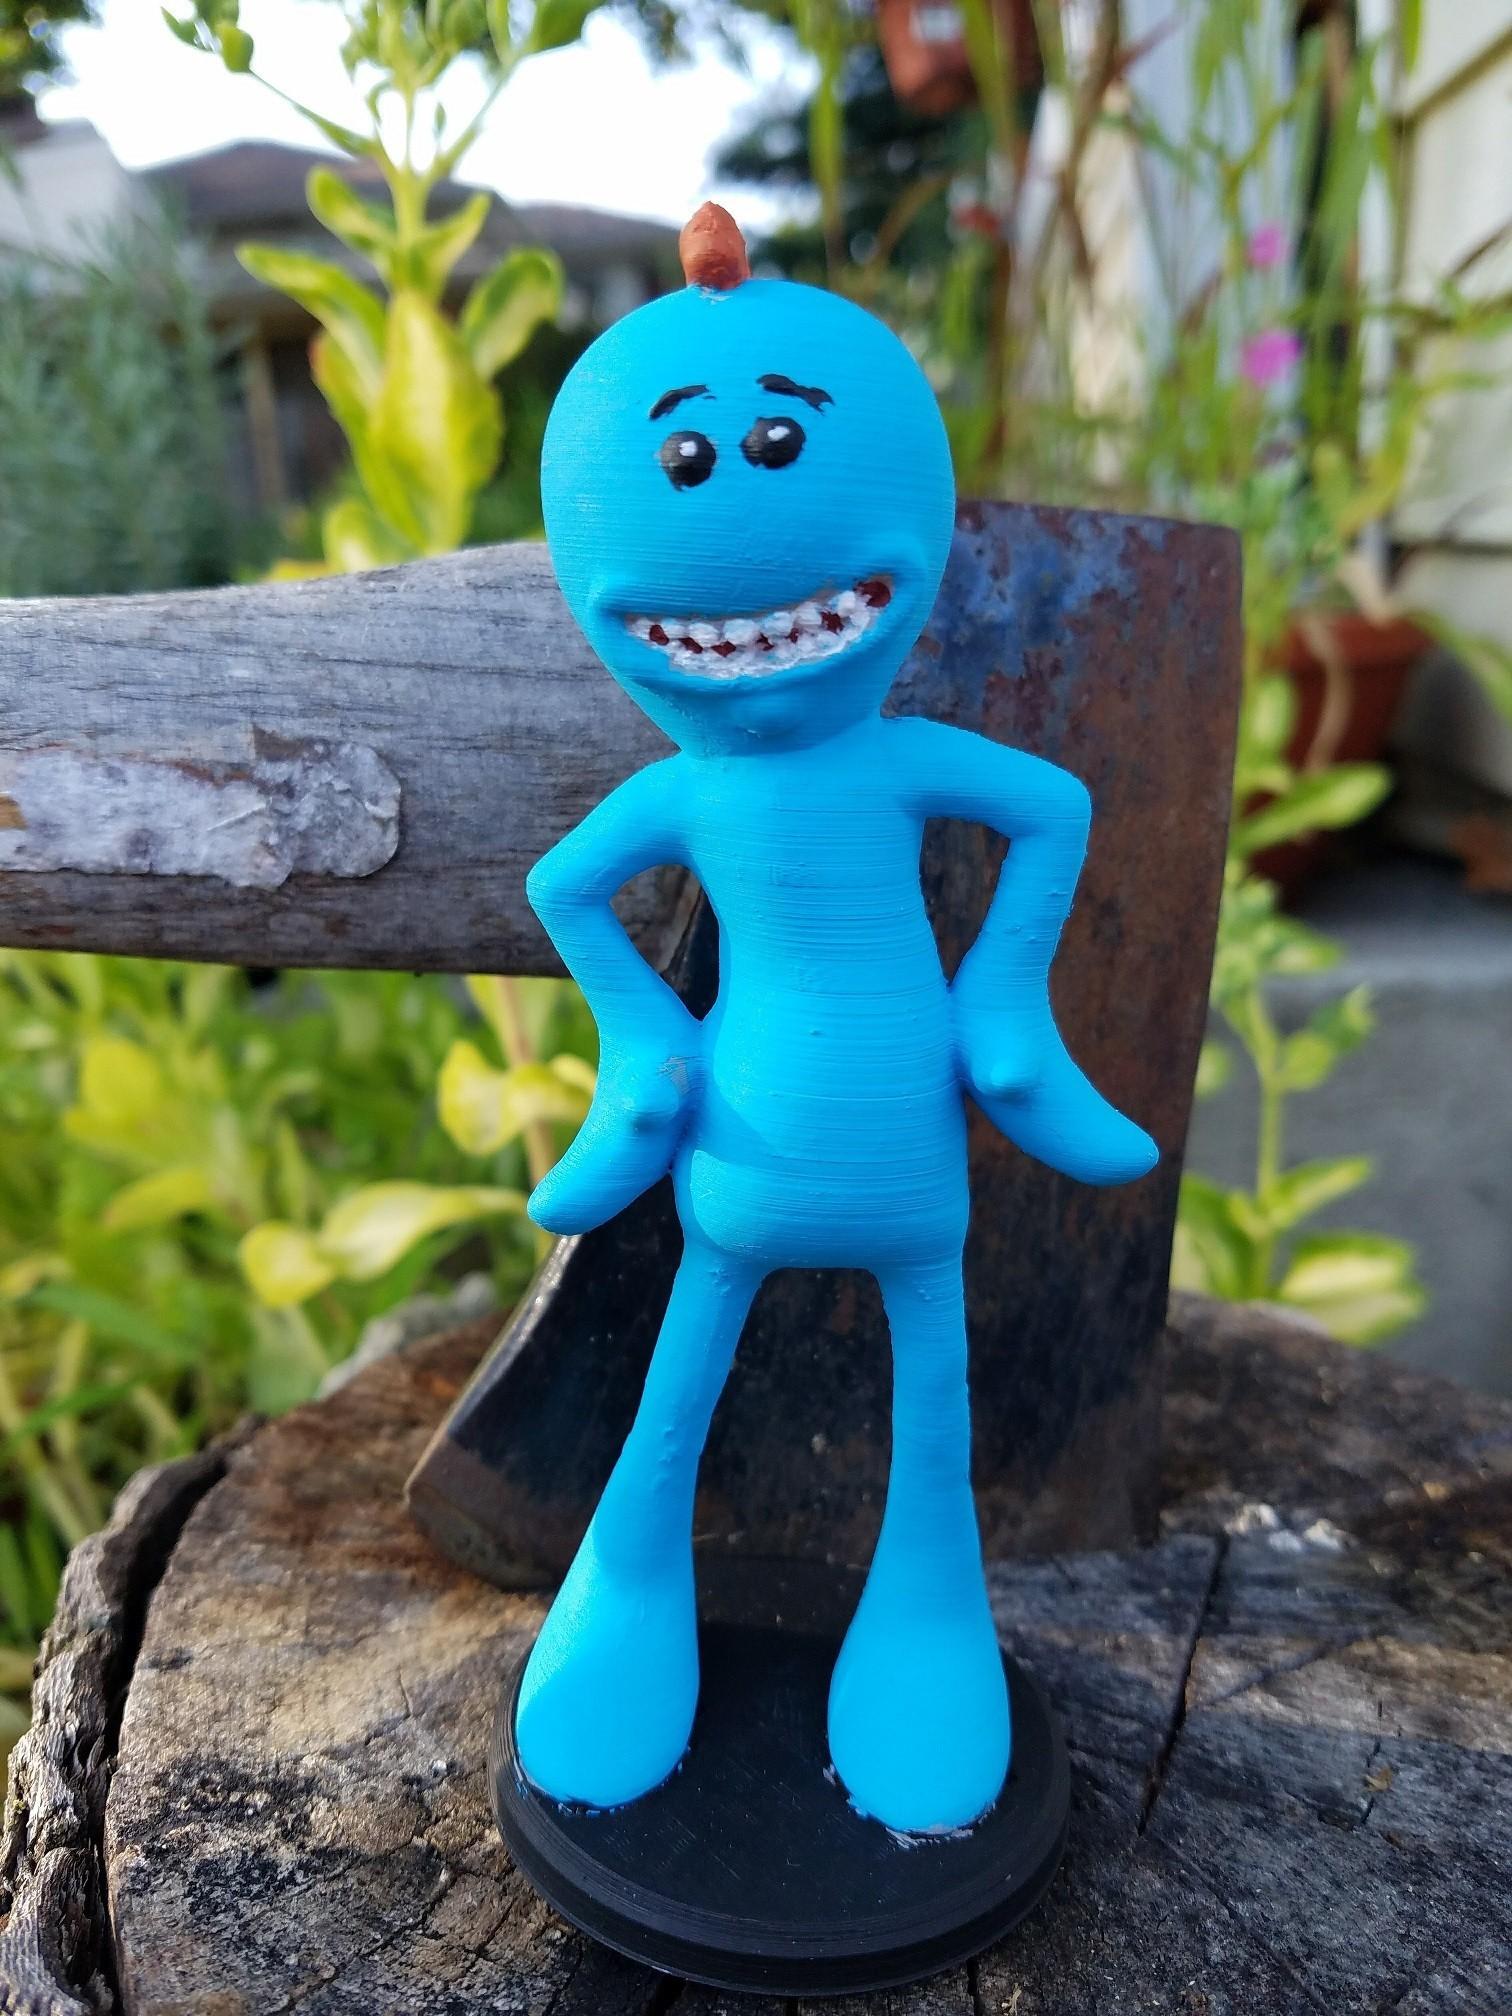 20170815_183236.jpg Download free STL file Rick and Morty assortment of Mr. Meeseeks • 3D printable model, Anthrobones